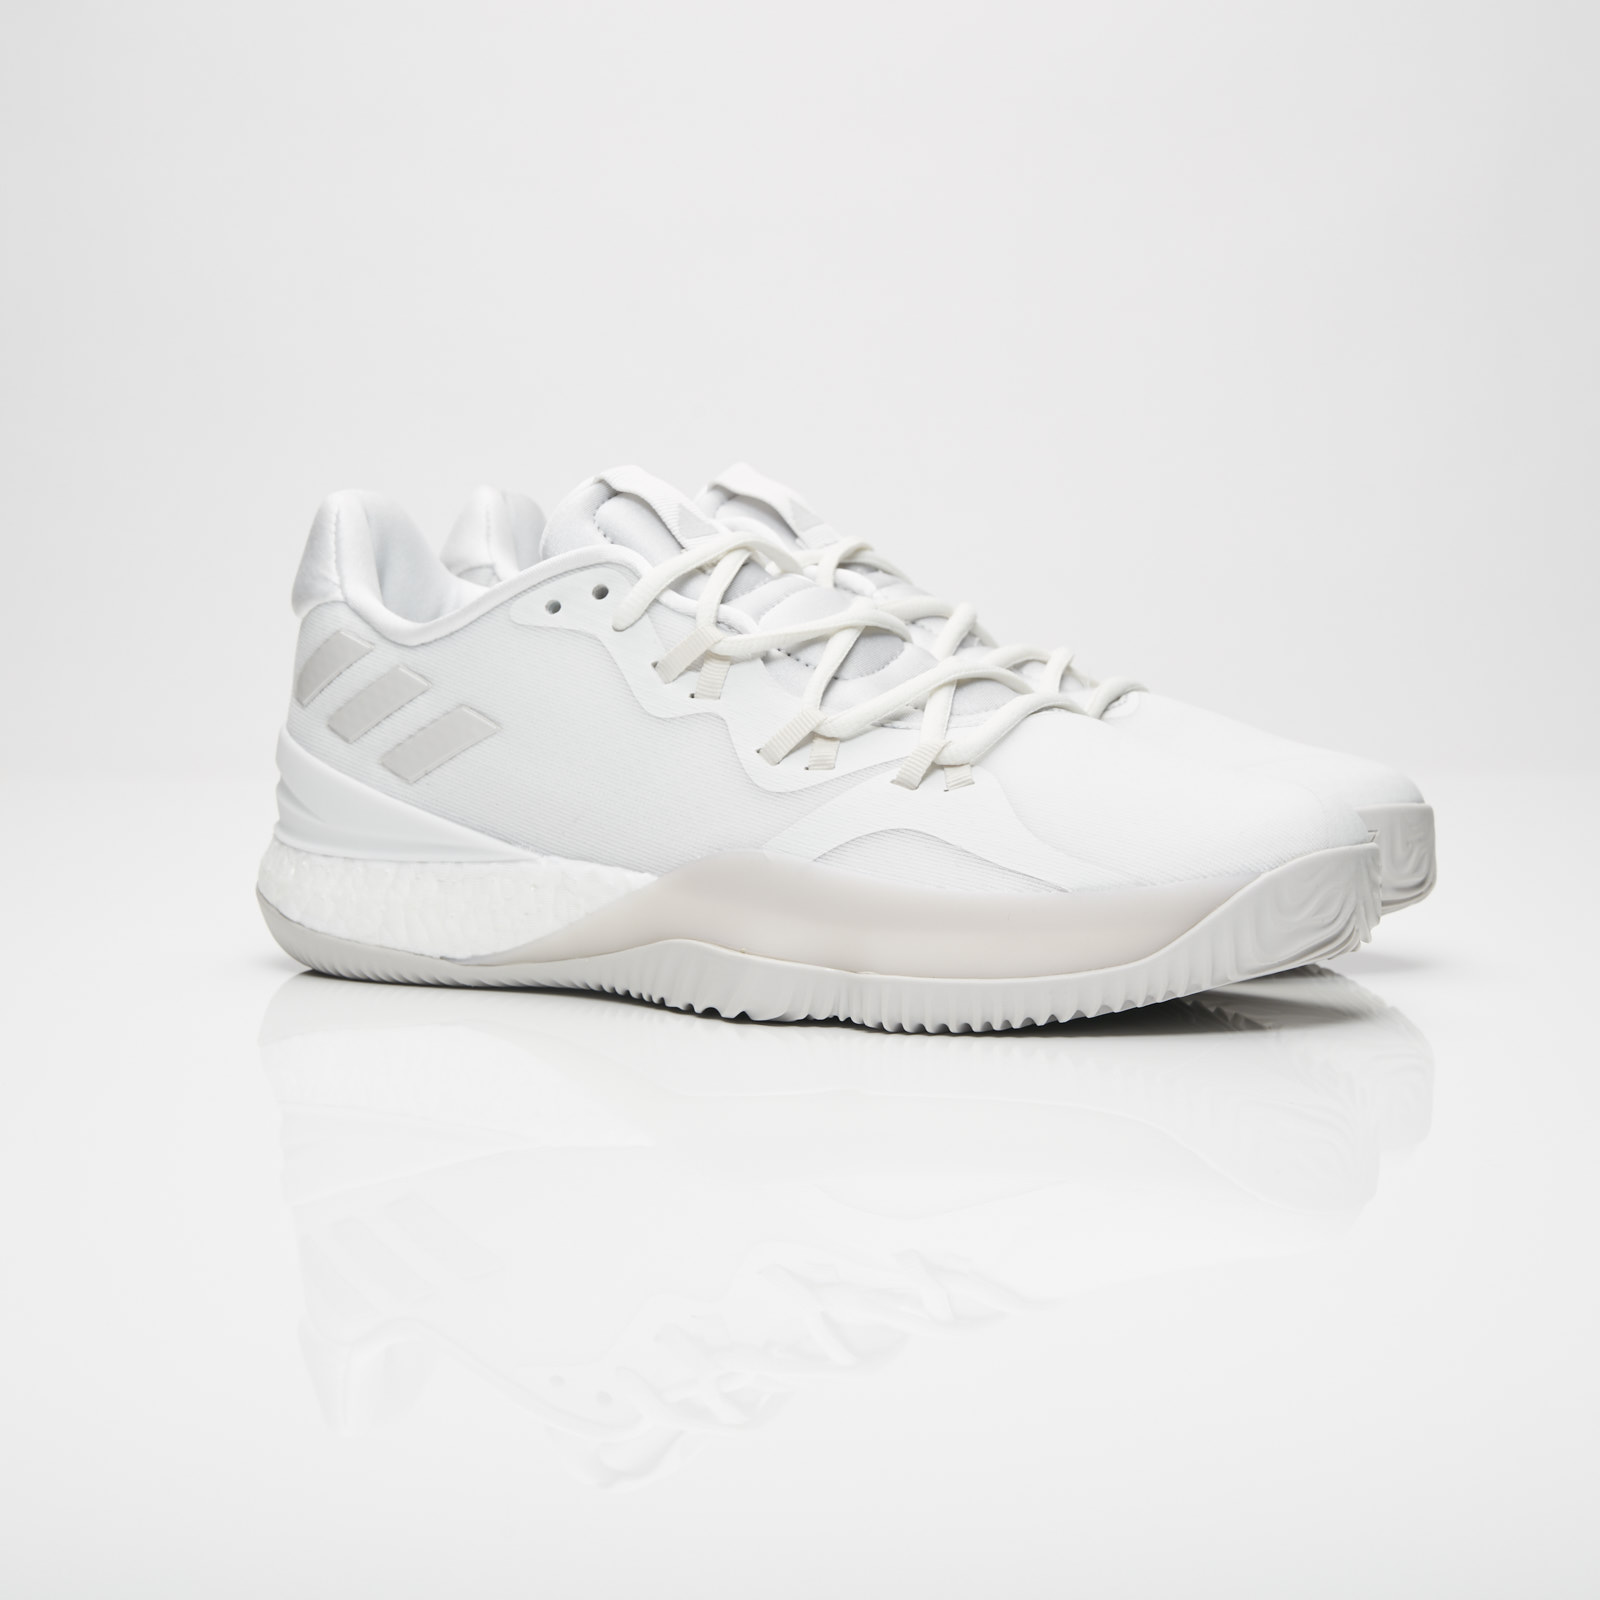 adidas Crazy Light Boost 2 Db1072 Sneakersnstuff I